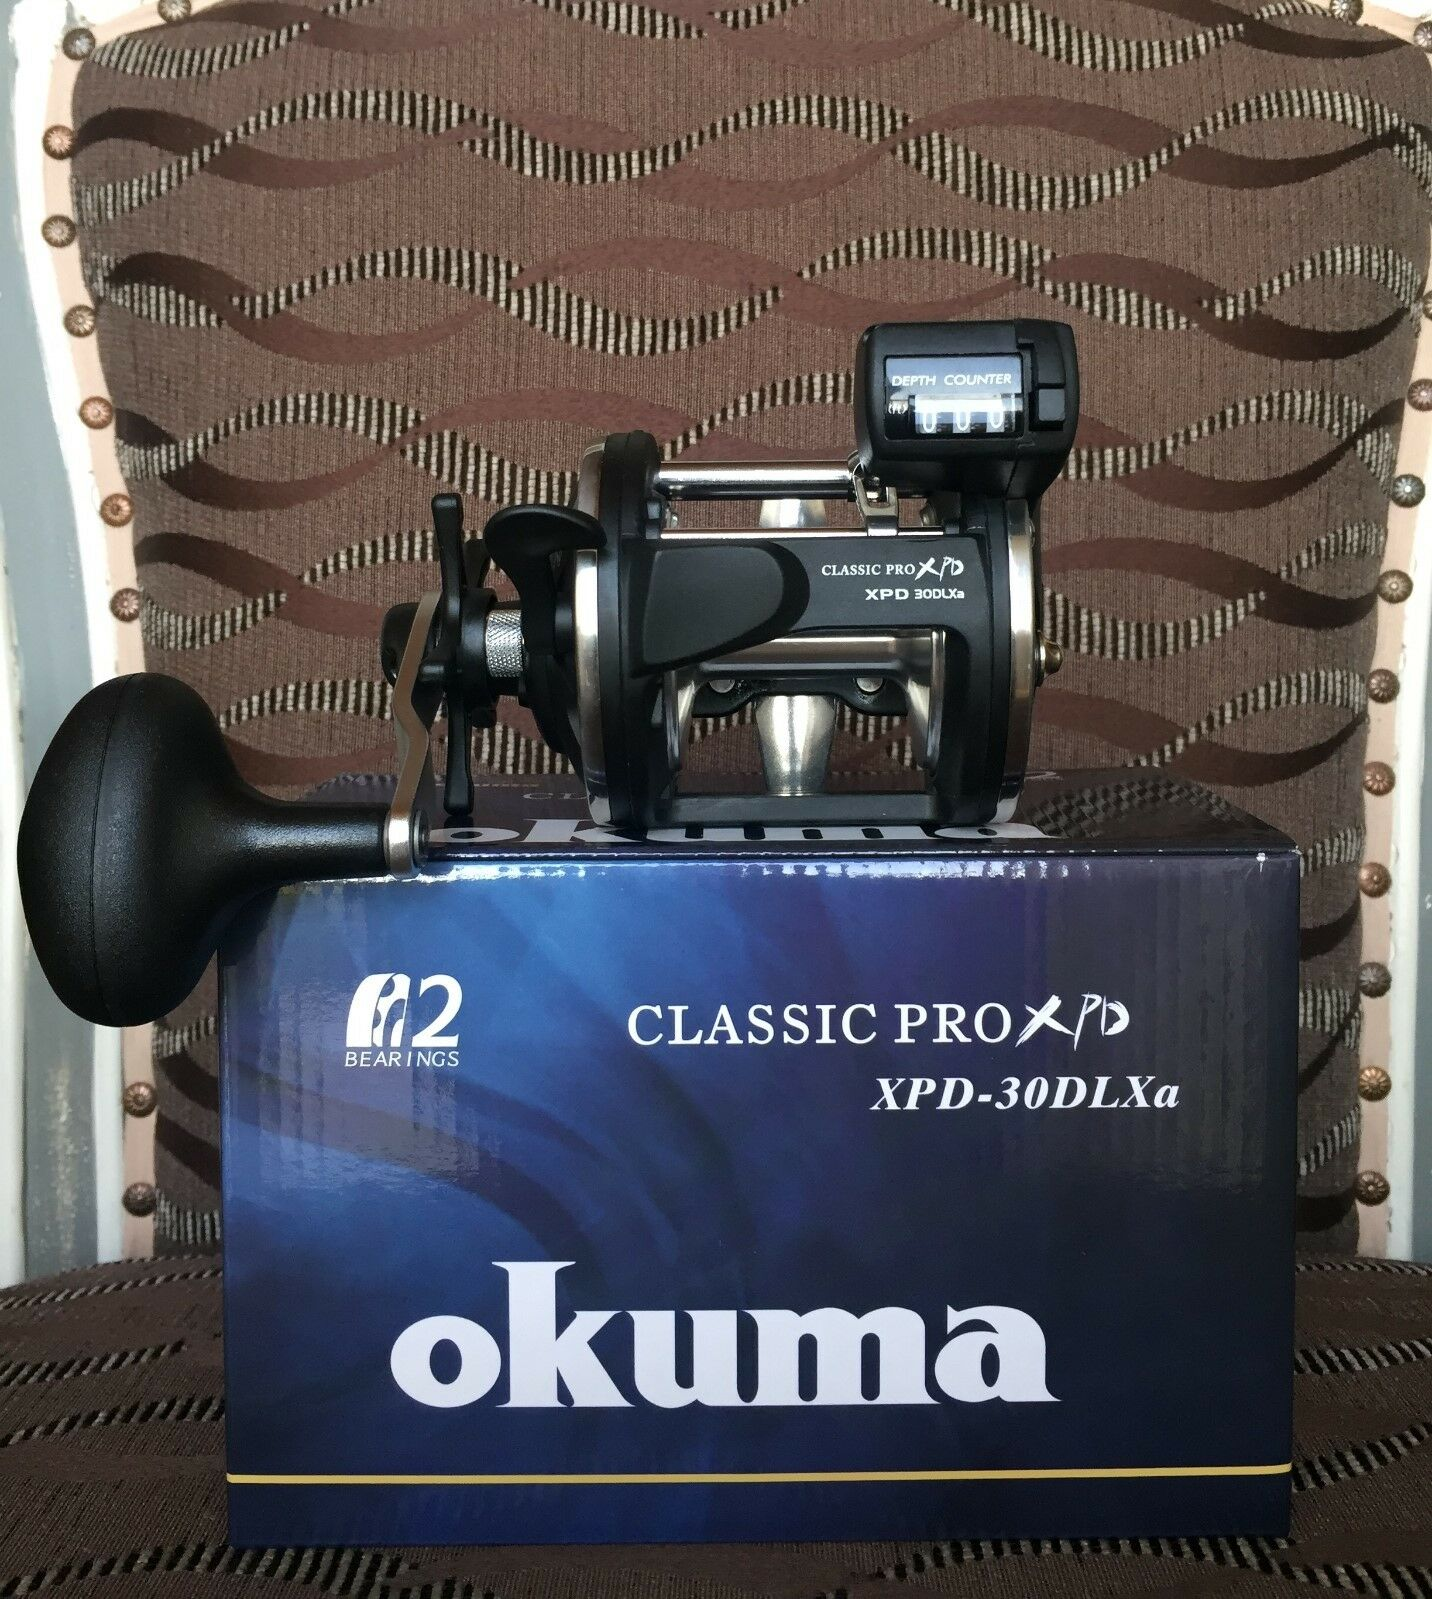 OKUMA xpd30dlxa Classic Pro XPD sinistra mano multi ruolo